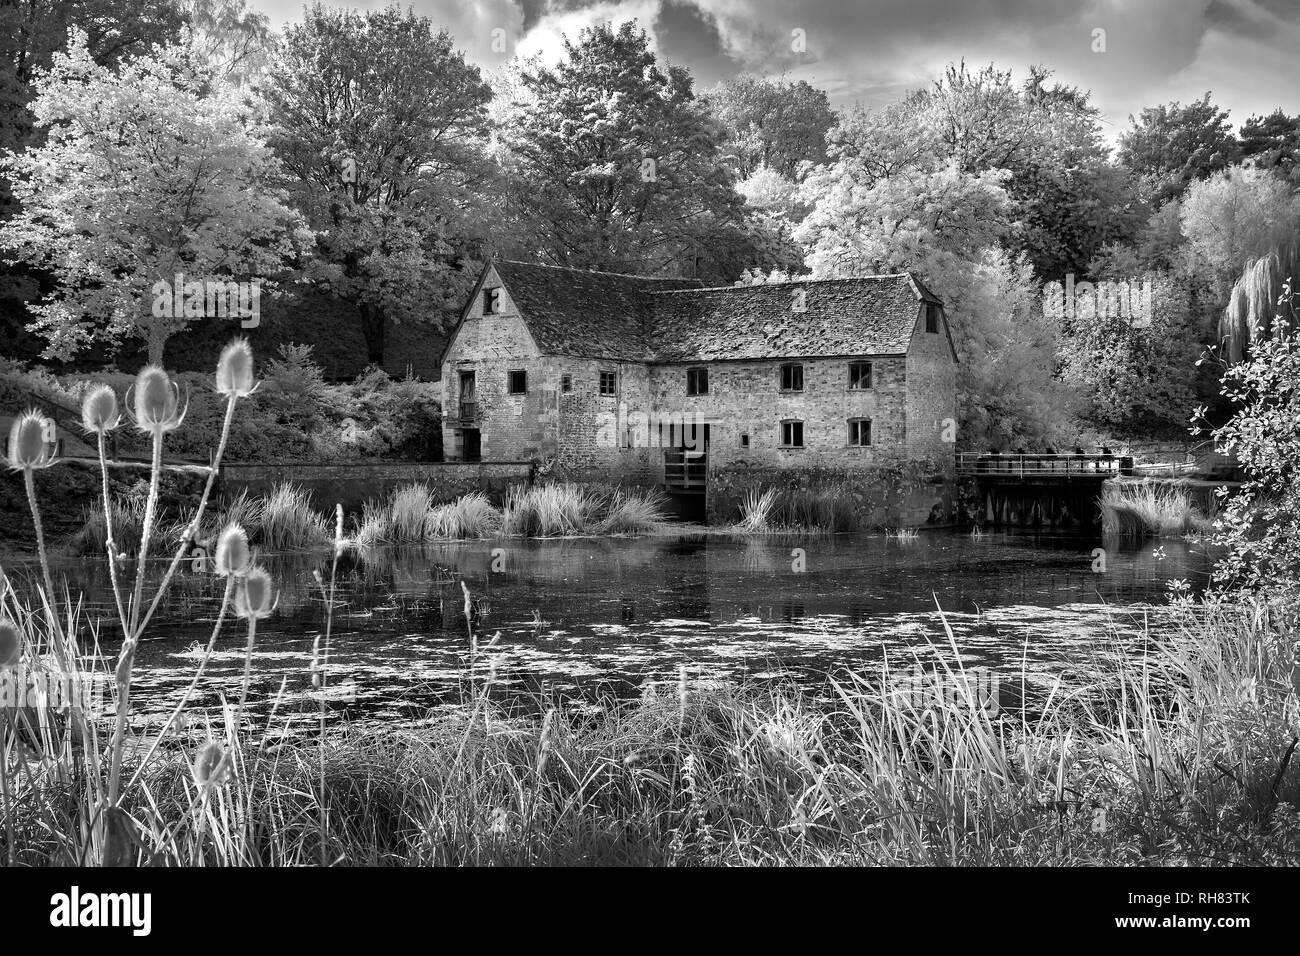 Infrared monochrome image of Sturminster Newton Mill in Dorset - Stock Image